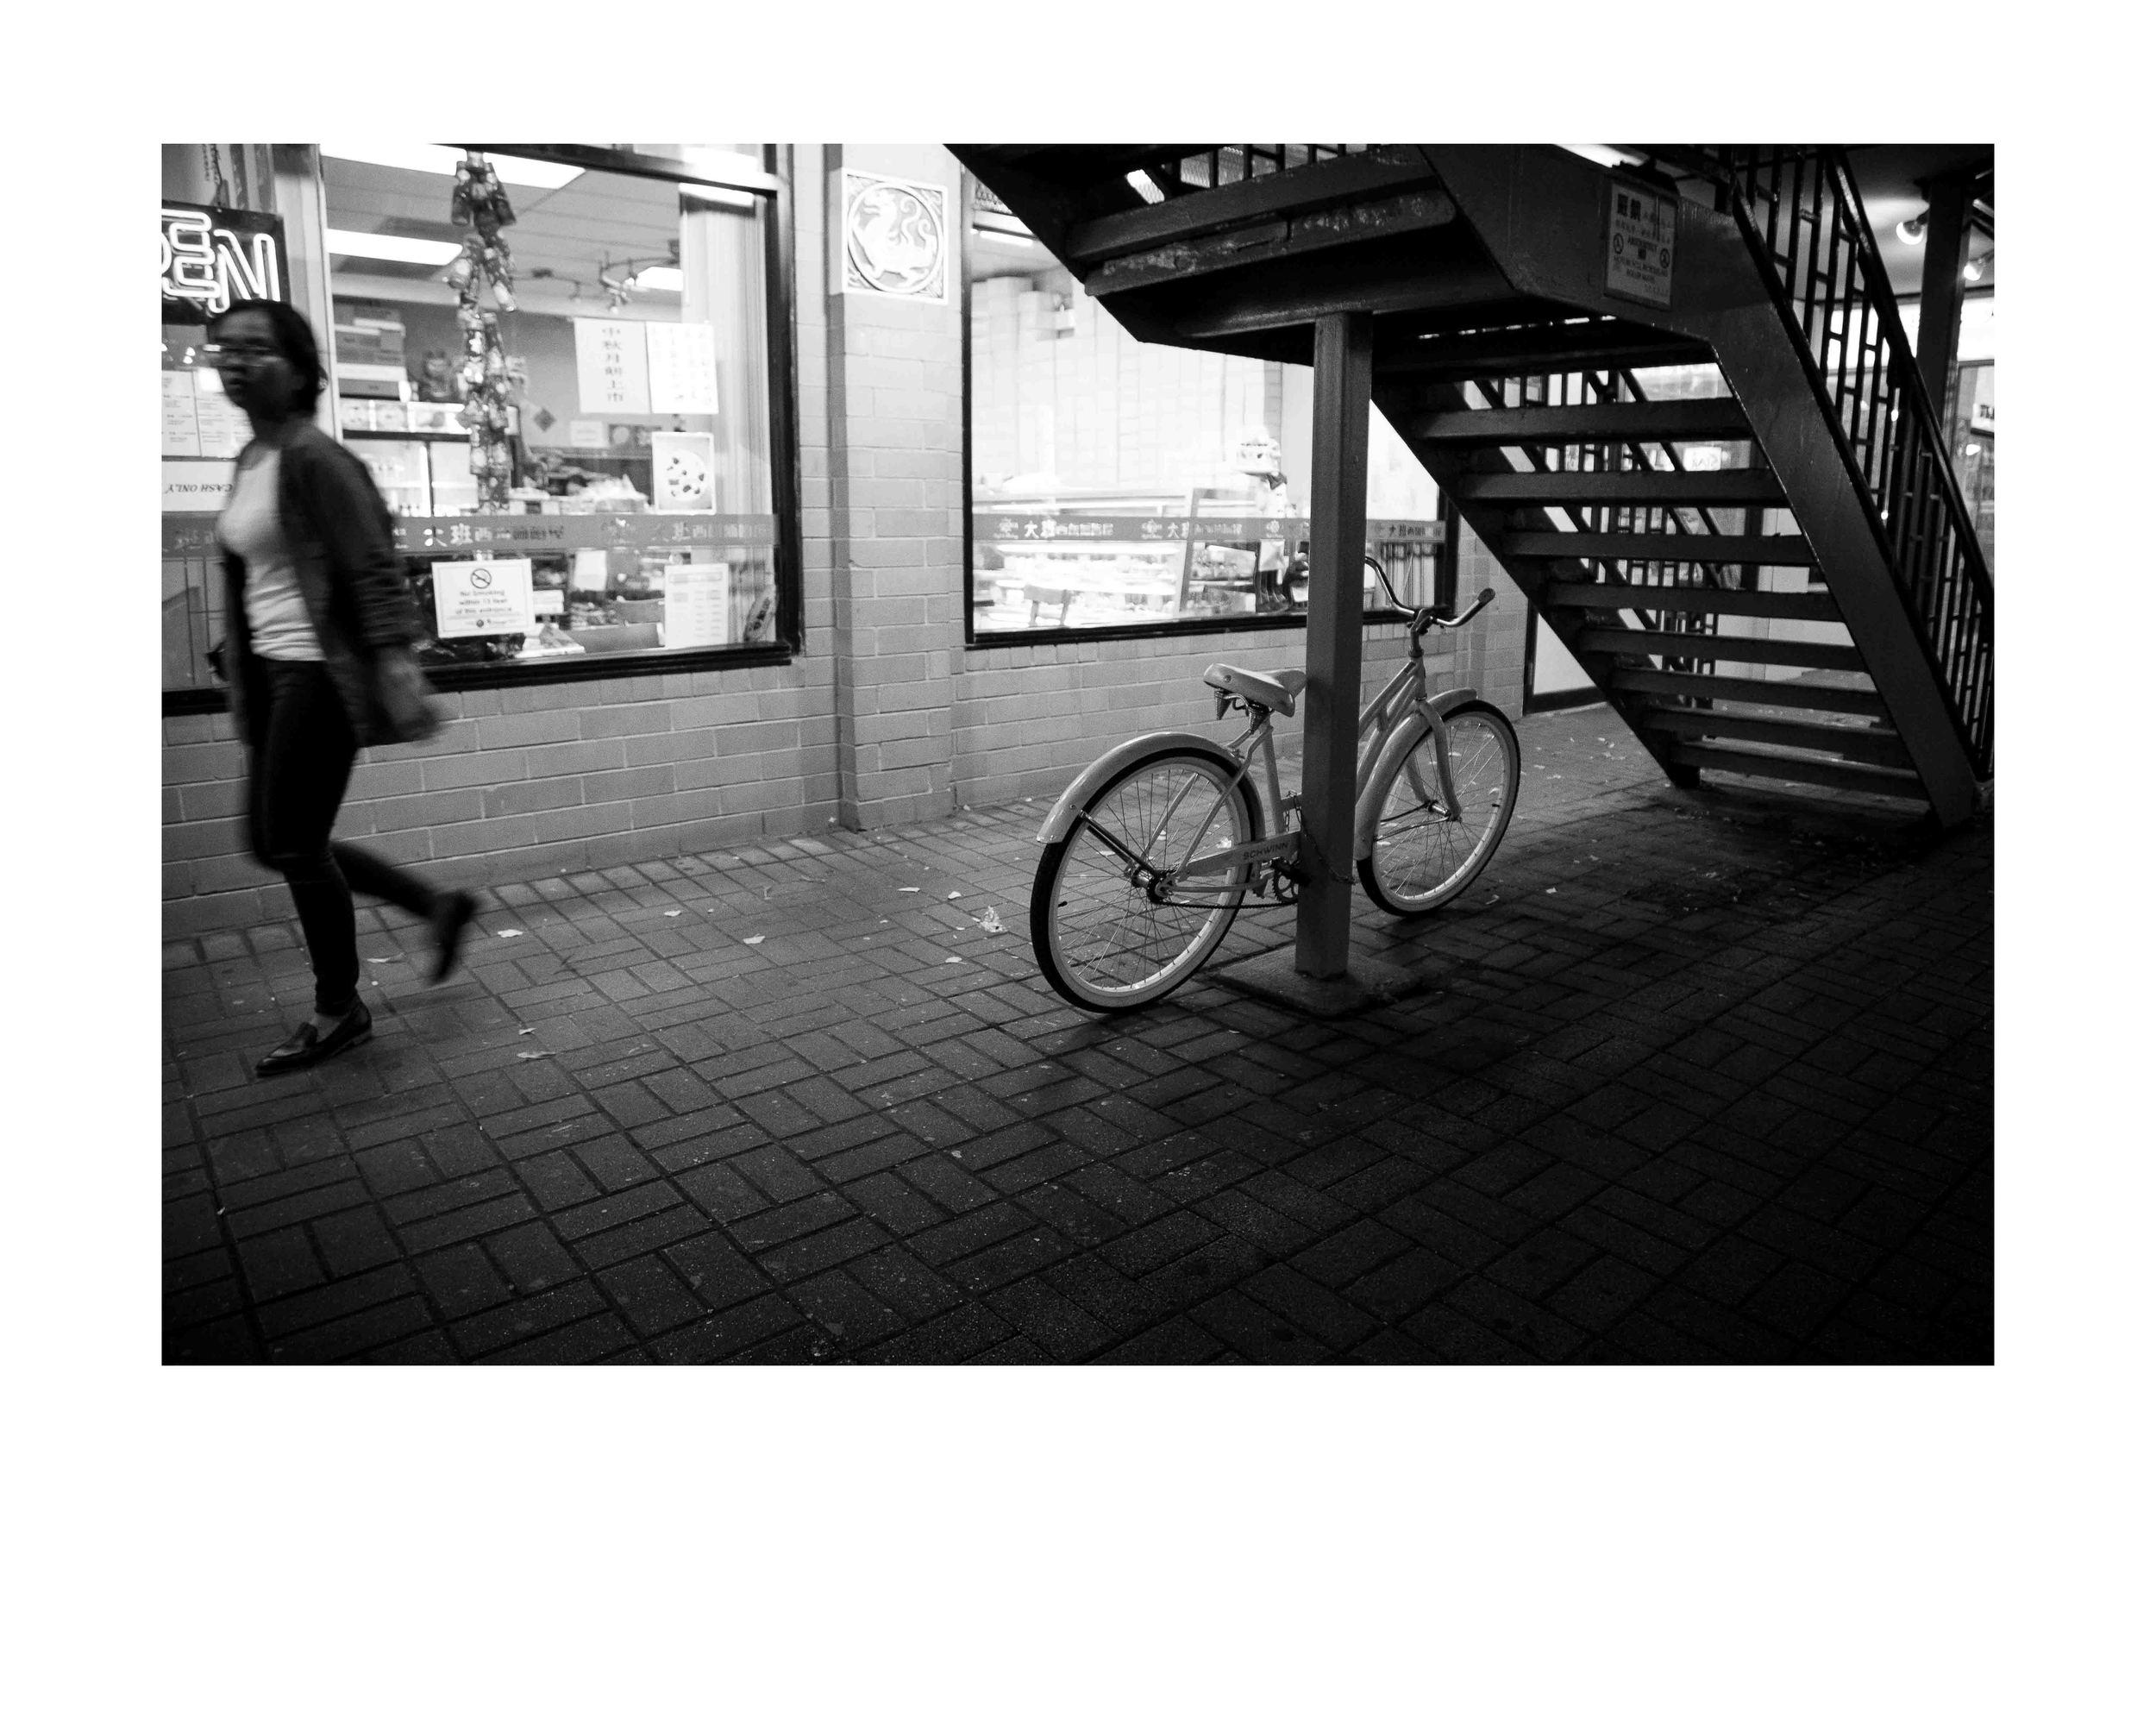 Chinatown Shadow.16x20 framed. $150